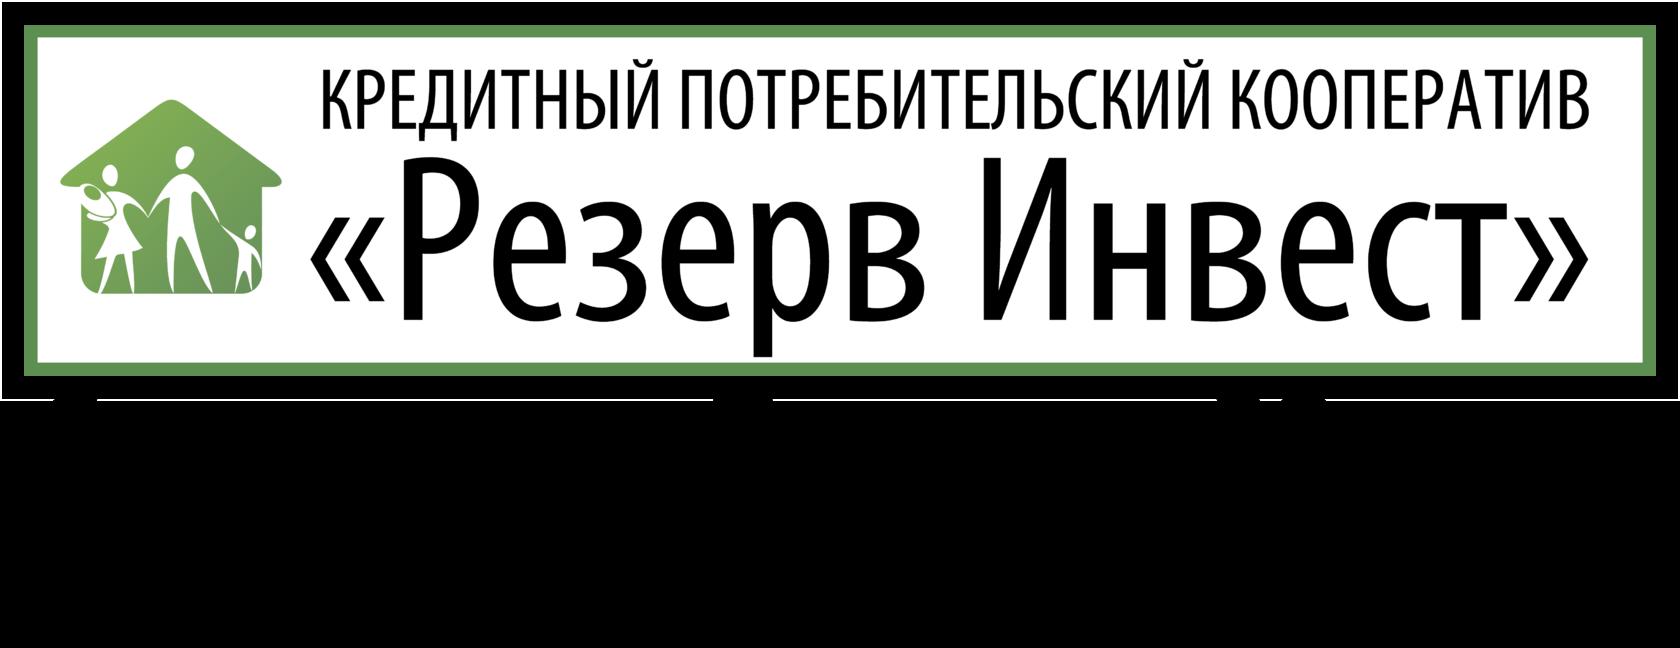 Резерв Финанс